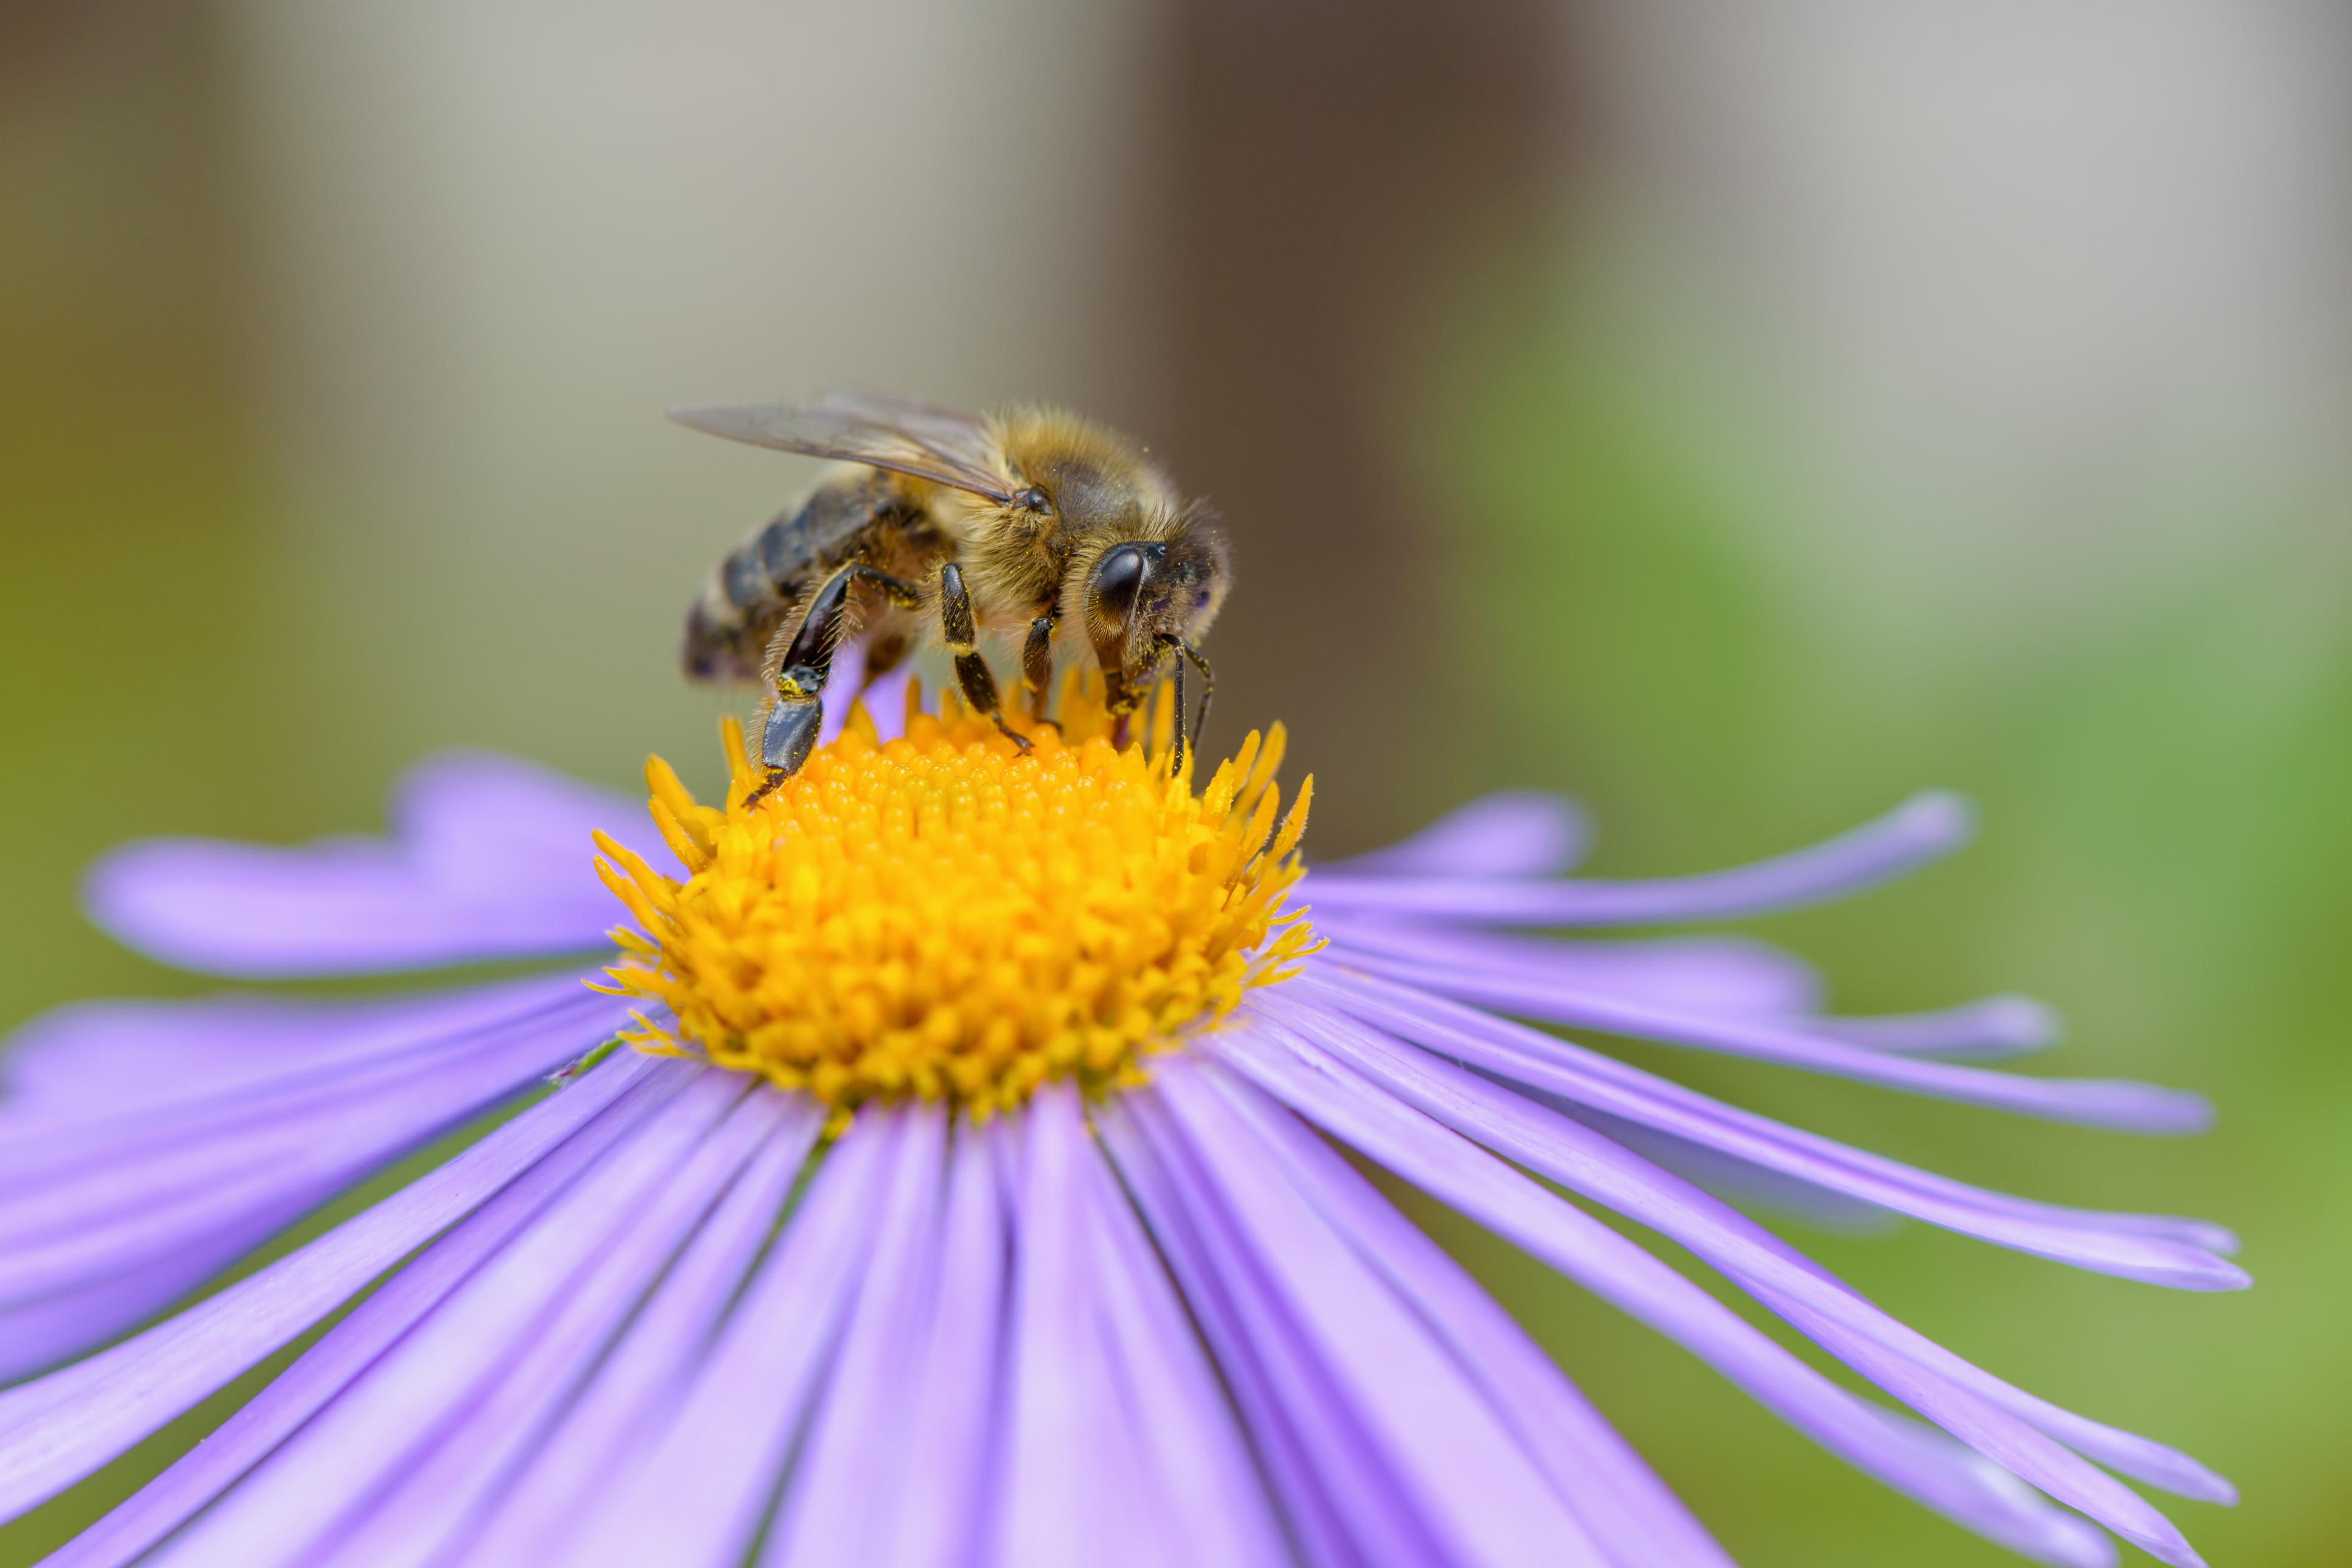 Honey Bee Image 01